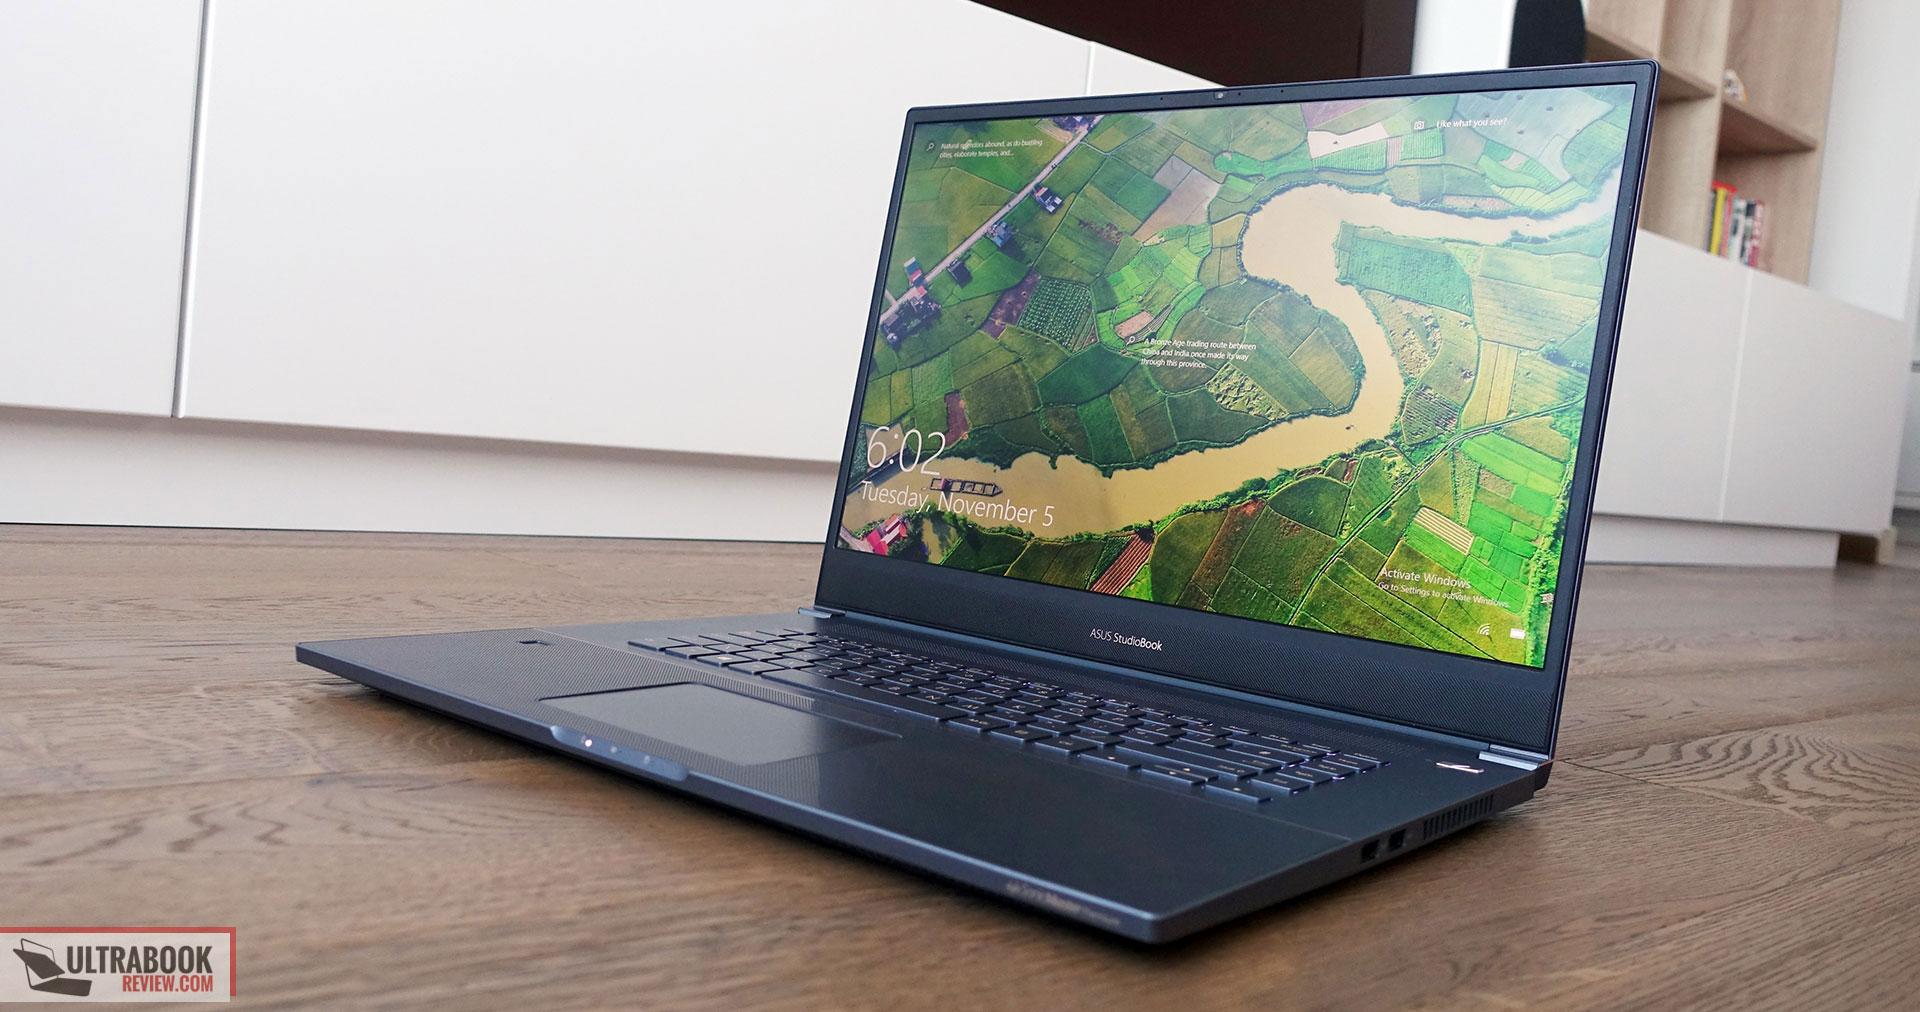 Asus StudioBook Pro W700